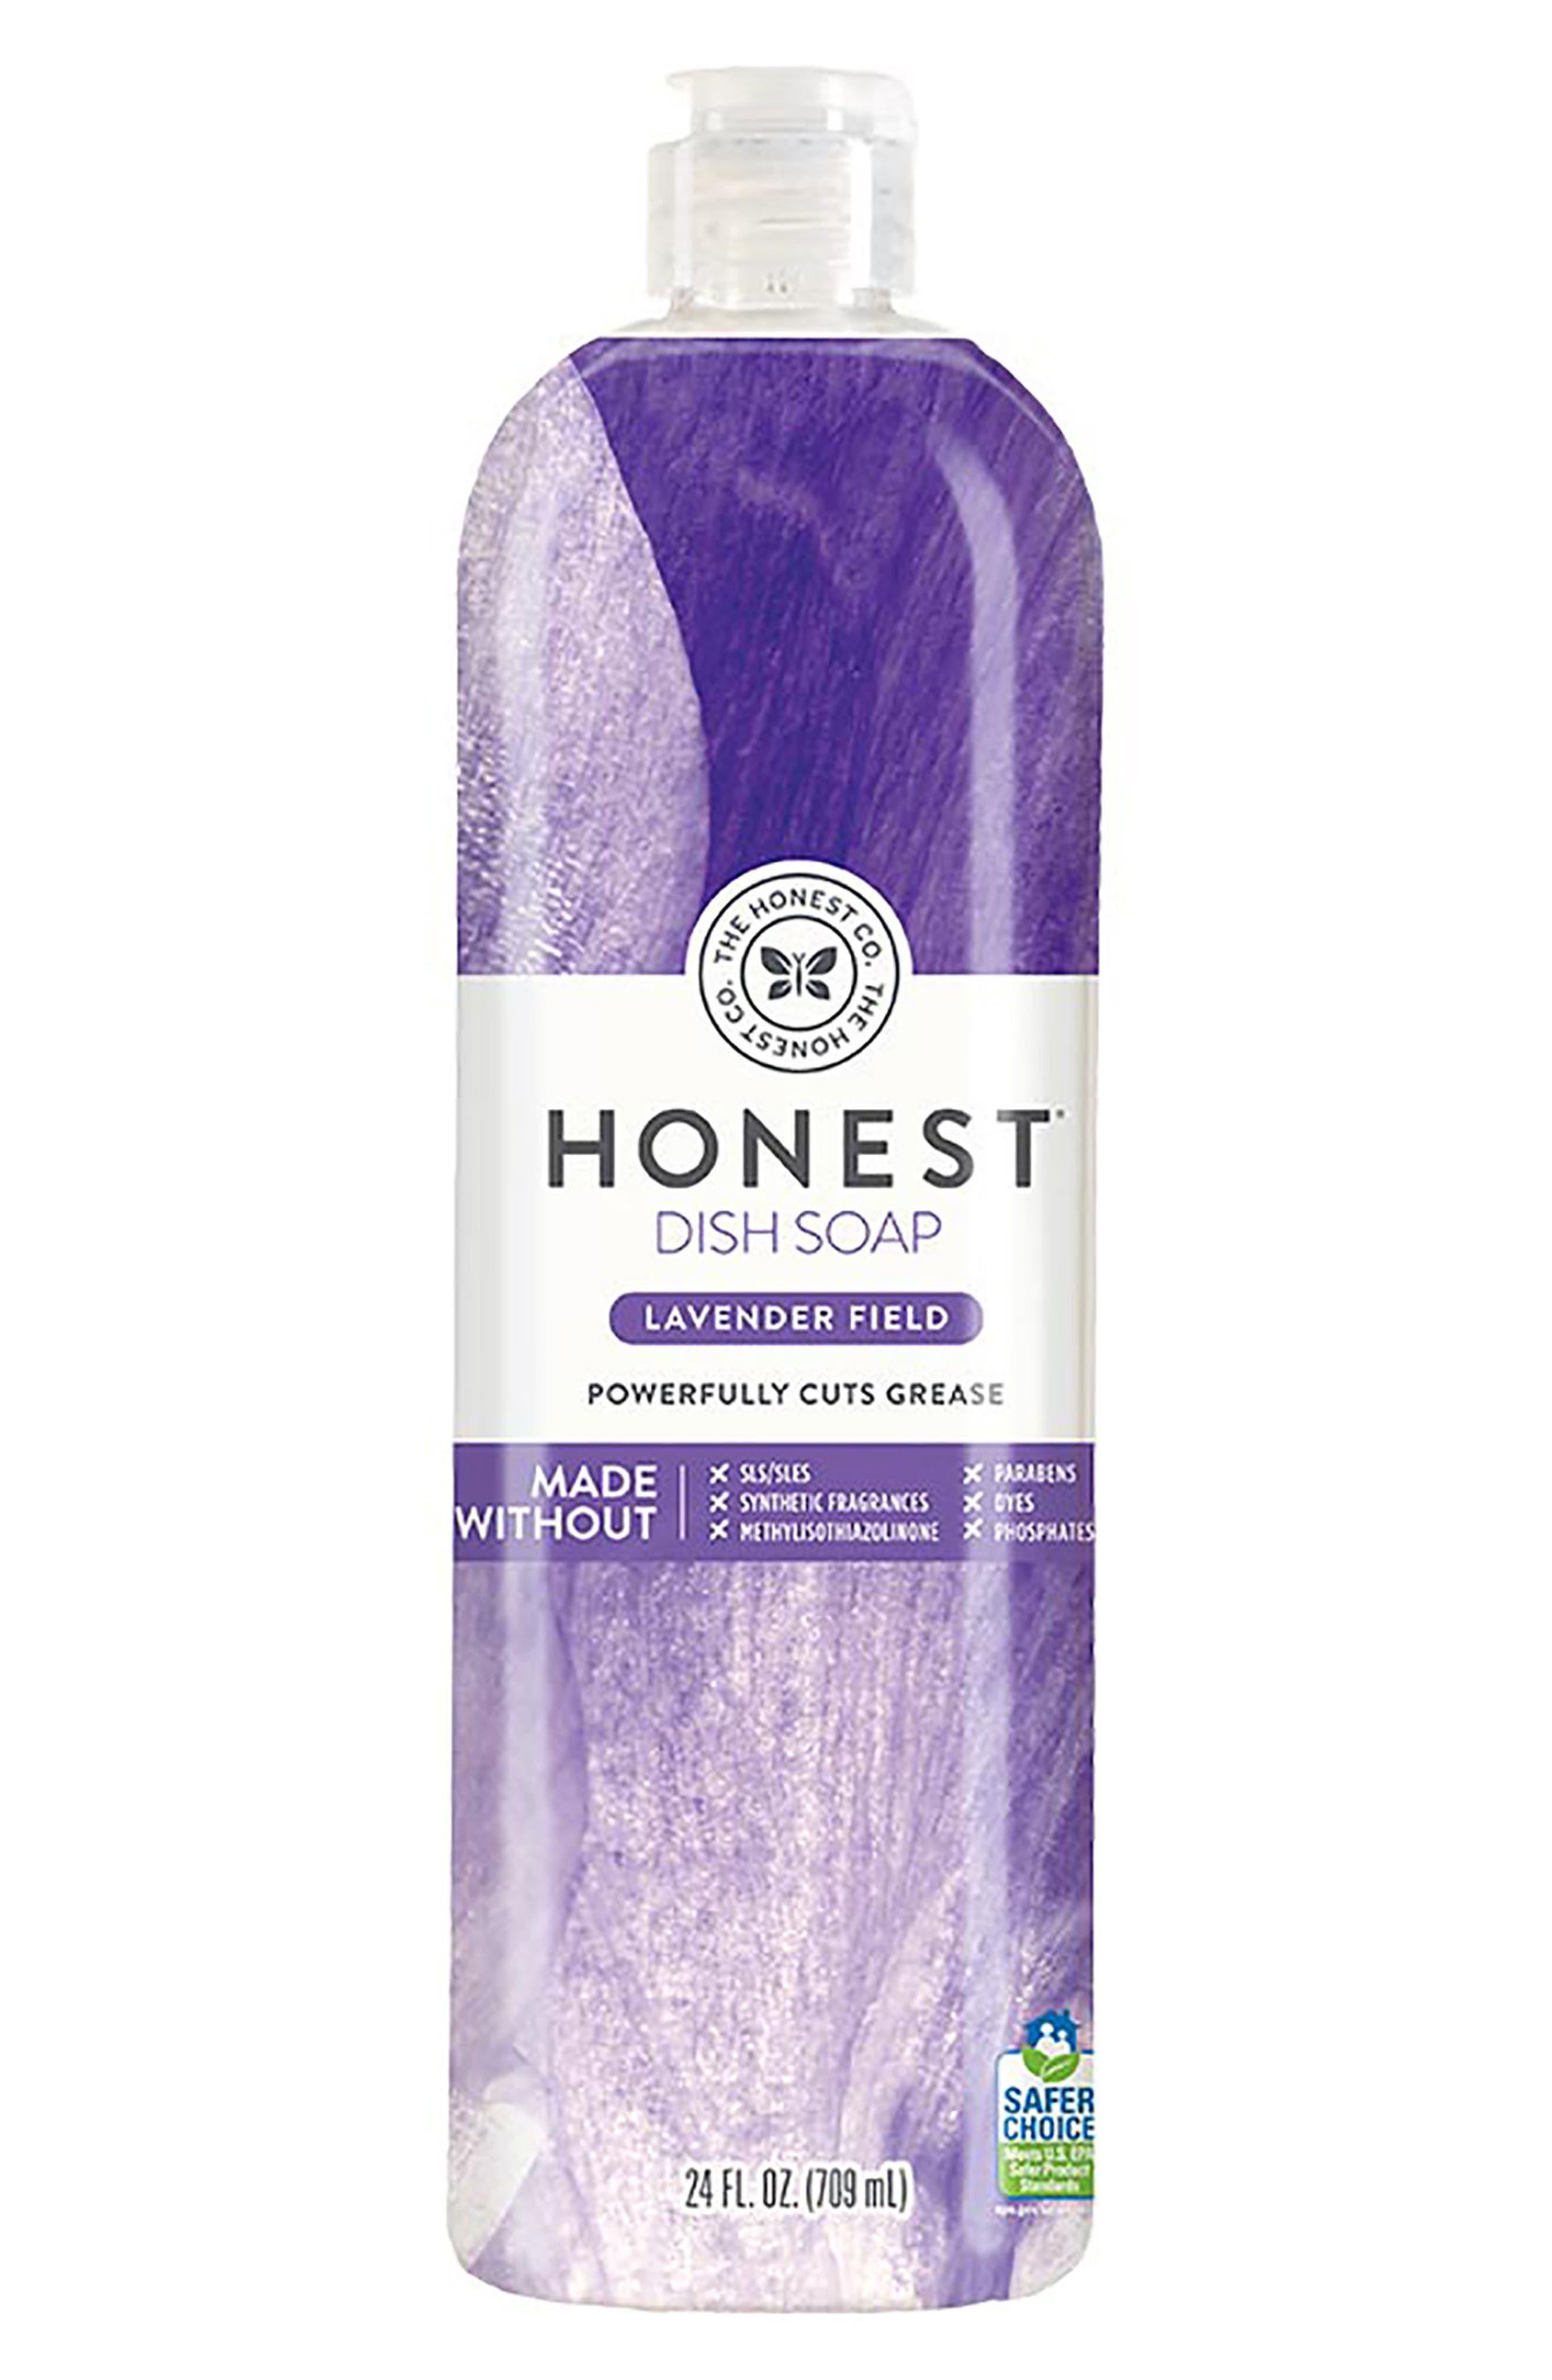 The Honest Company Lavender Field Dish Soap